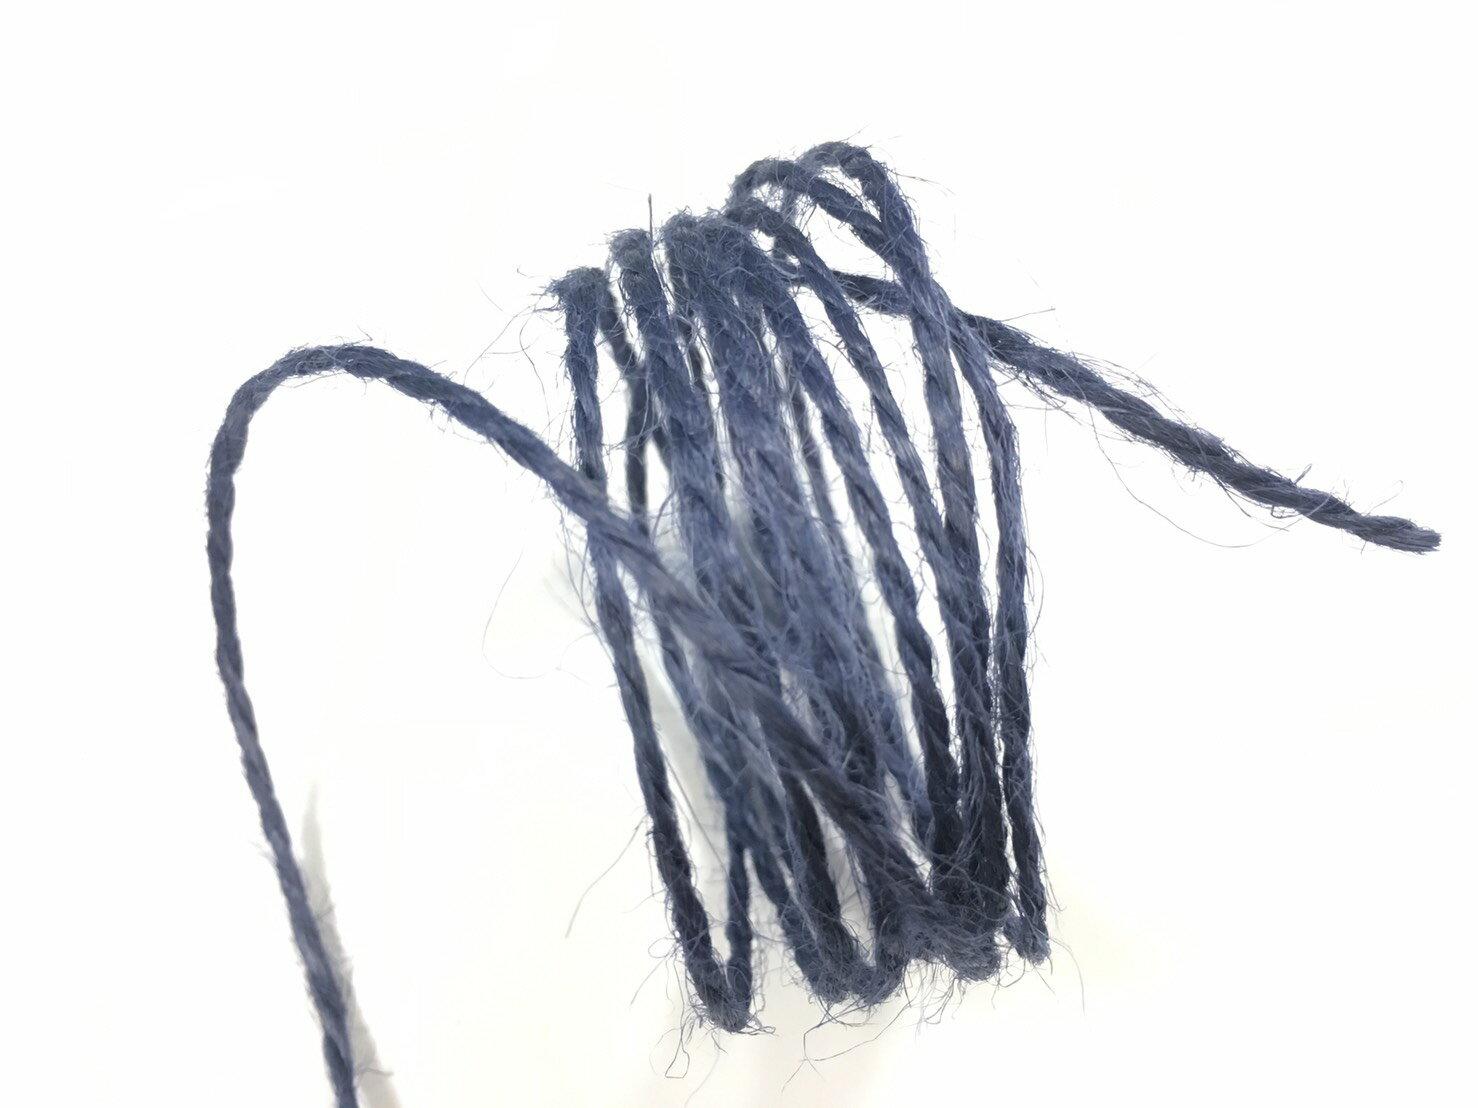 【Crystal Rose緞帶專賣店】單色素麻繩 2mm 5碼裝 (15色) 9